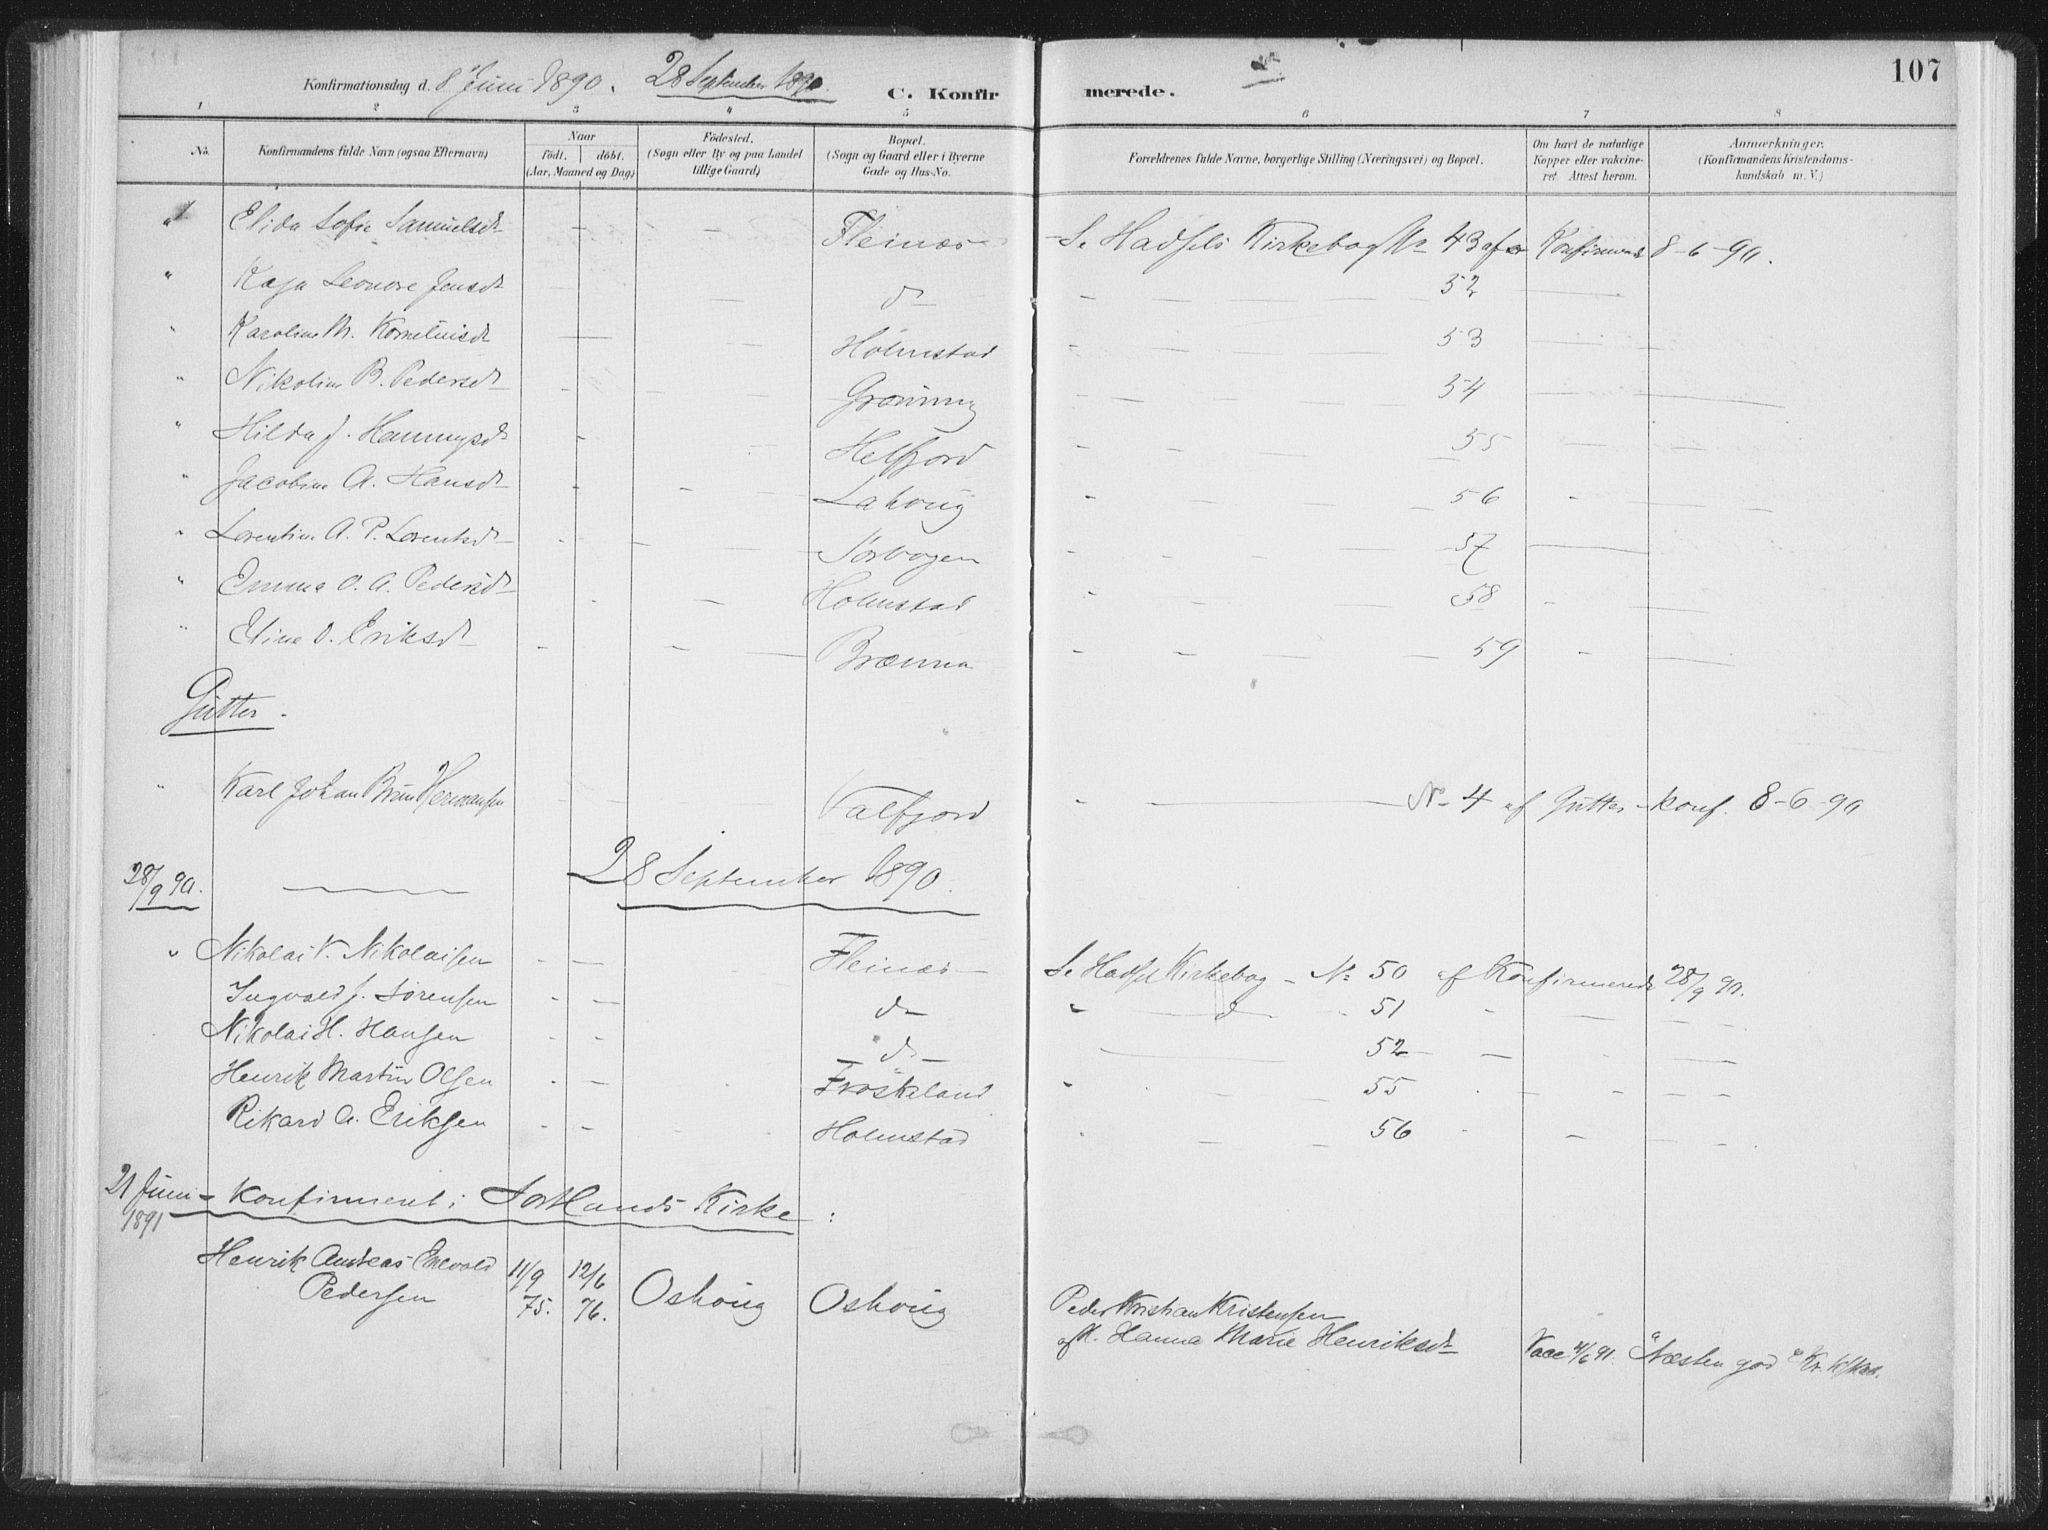 SAT, Ministerialprotokoller, klokkerbøker og fødselsregistre - Nordland, 890/L1286: Ministerialbok nr. 890A01, 1882-1902, s. 107